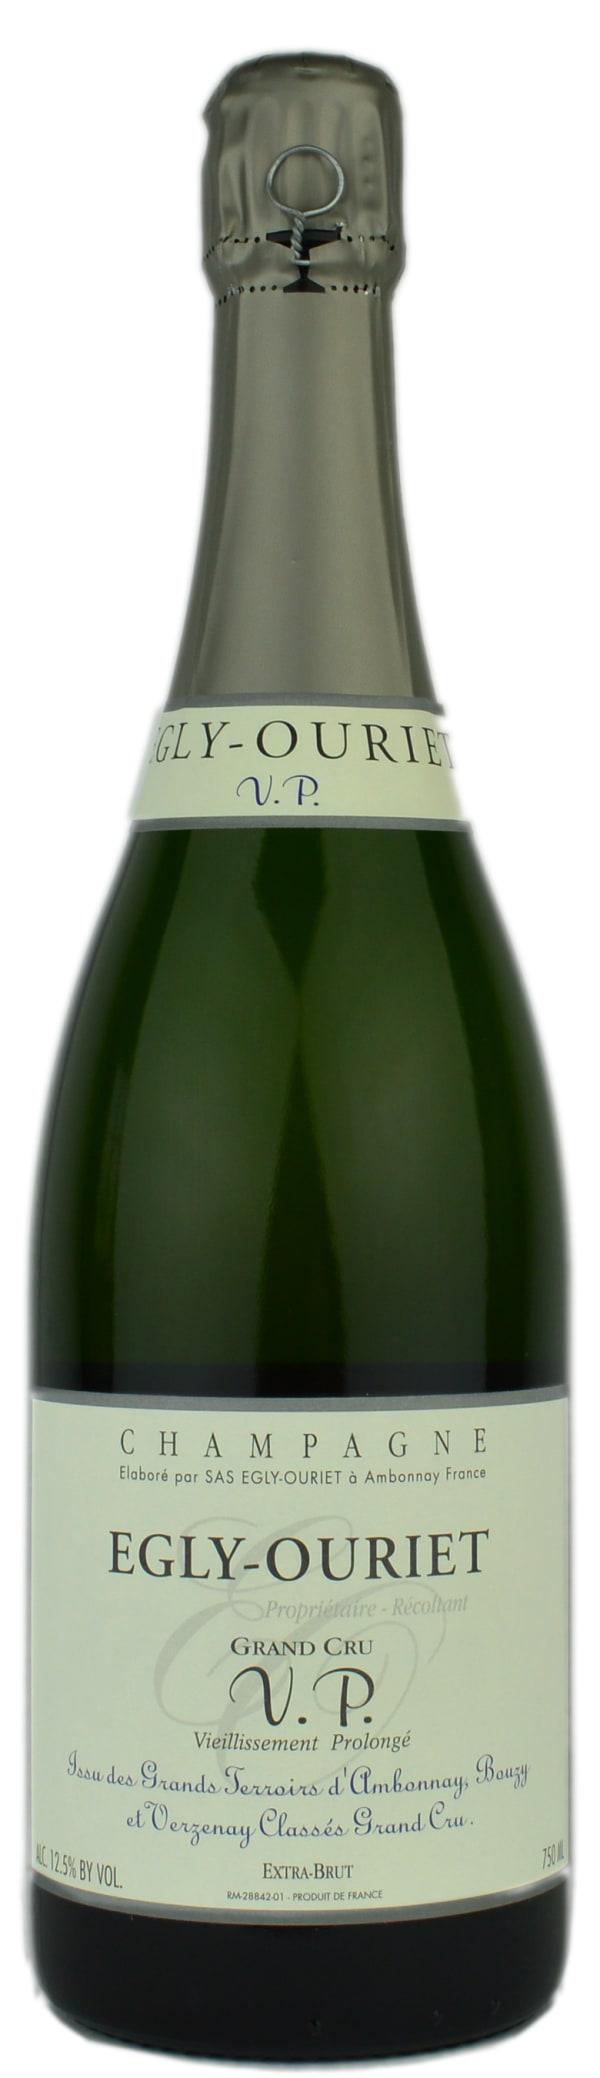 Egly-Ouriet V.P. Grand Cru Champagne Extra-Brut